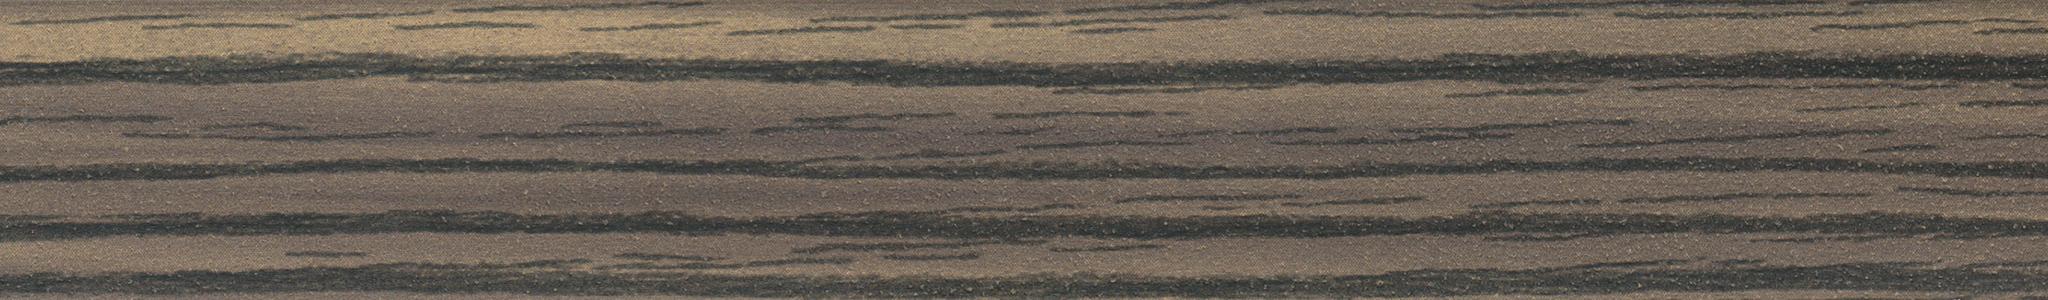 HD 287488 кромка ABS черное дерево жемчуг